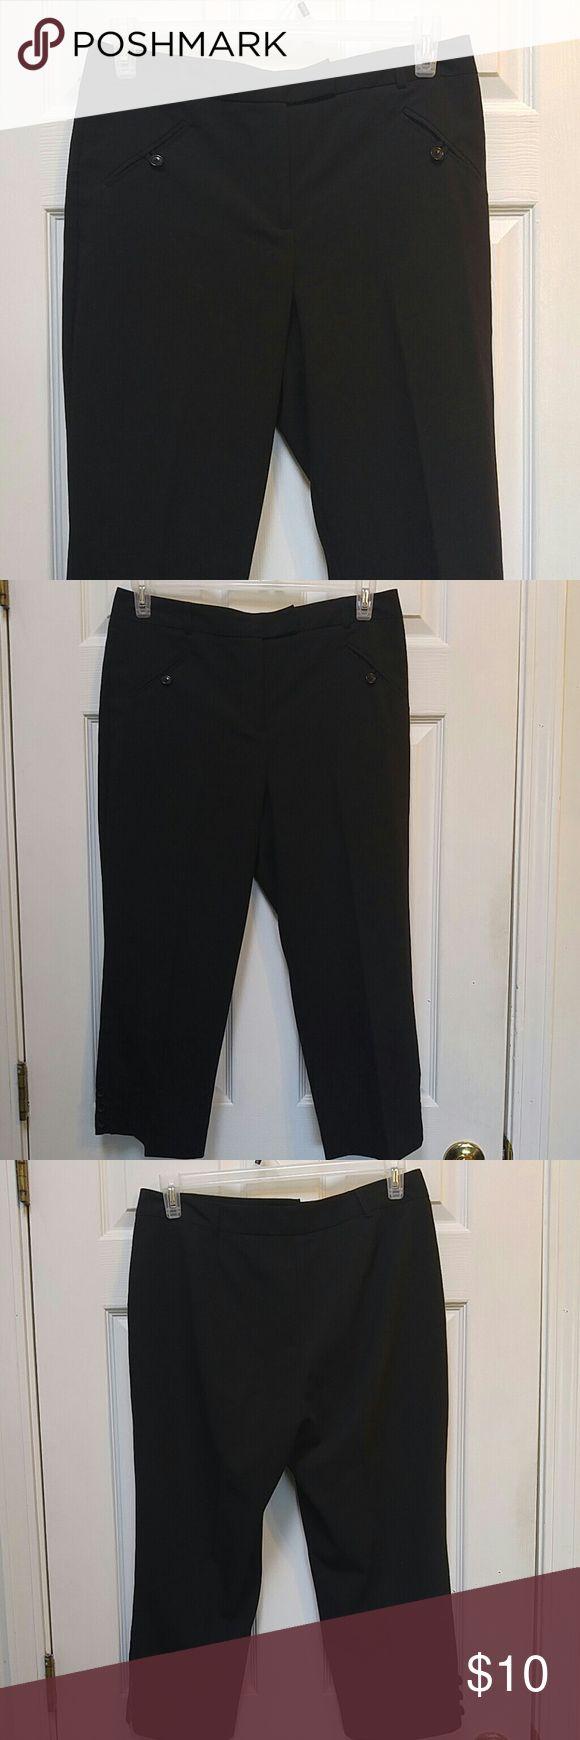 Dressbarn Black Capris | Black capris, Dress barn pants ...